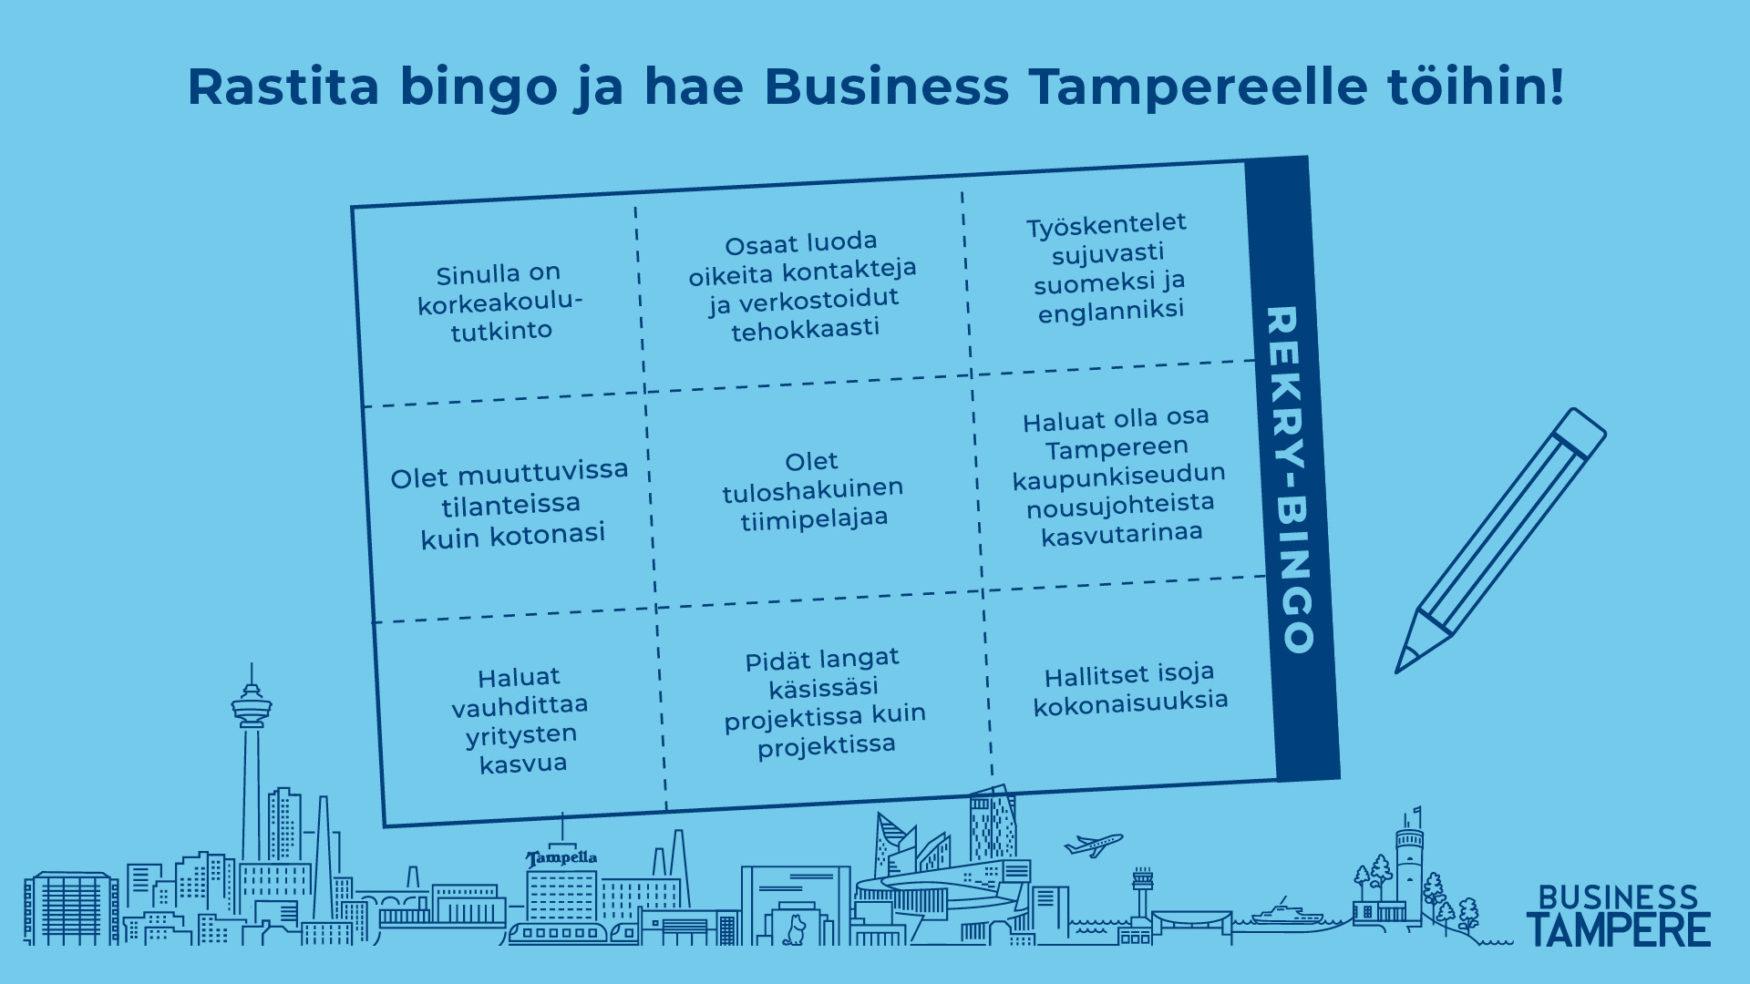 rekrybingo Business Tampere rekrytoi